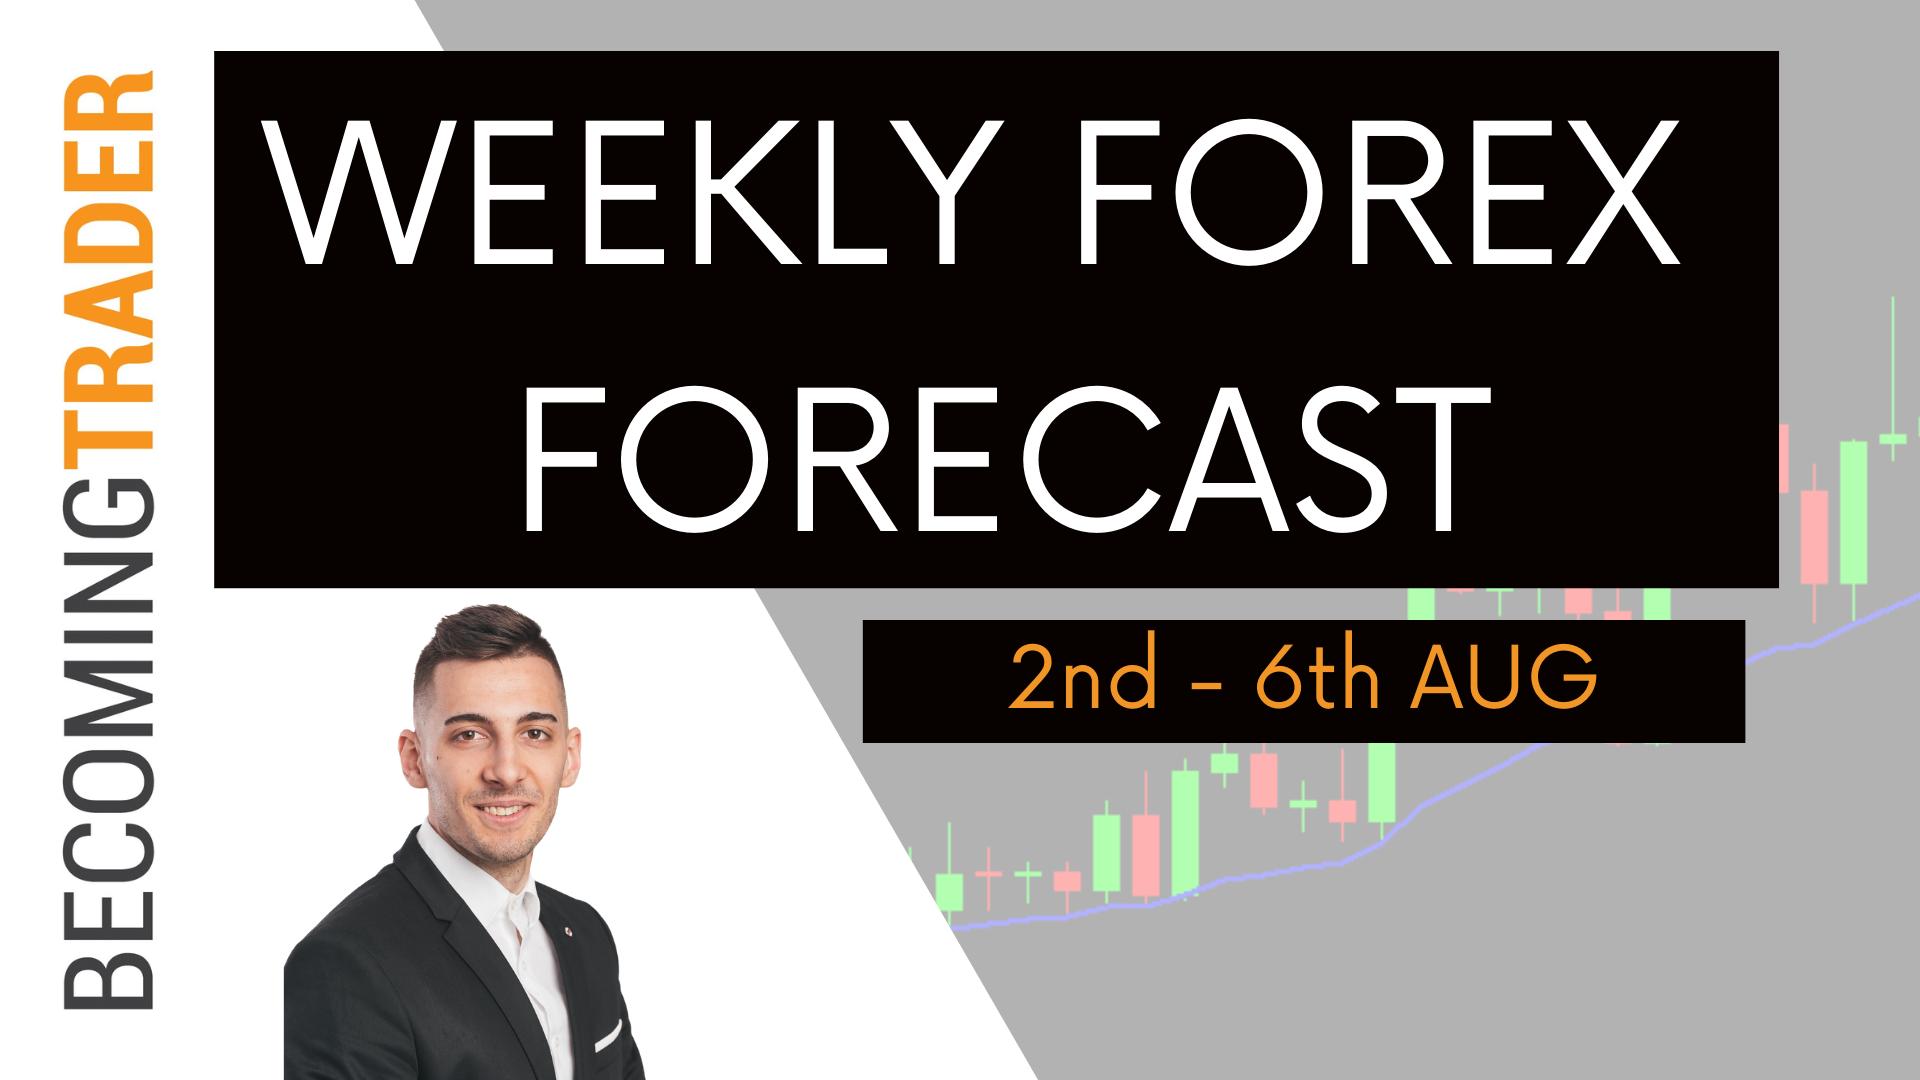 Weekly Forex Forecast 2nd to 6th August 2021   EURUSD , GBPUSD , AUDUSD , NZDUSD , USDCAD , USDJPY